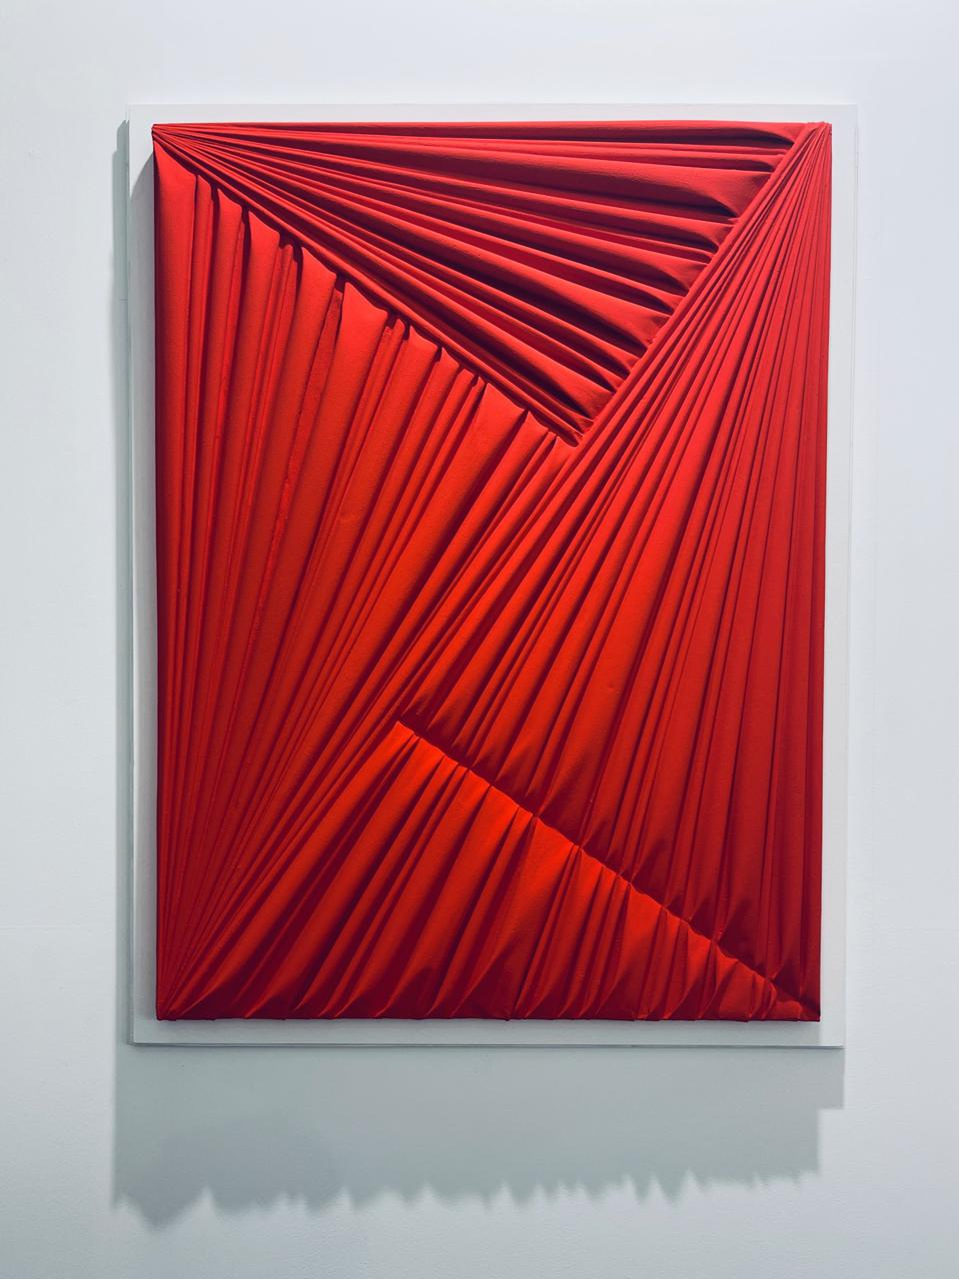 ″La Forma Celata, Red 2015″ by Umberto Mariani via Custot Gallery (Dubai)